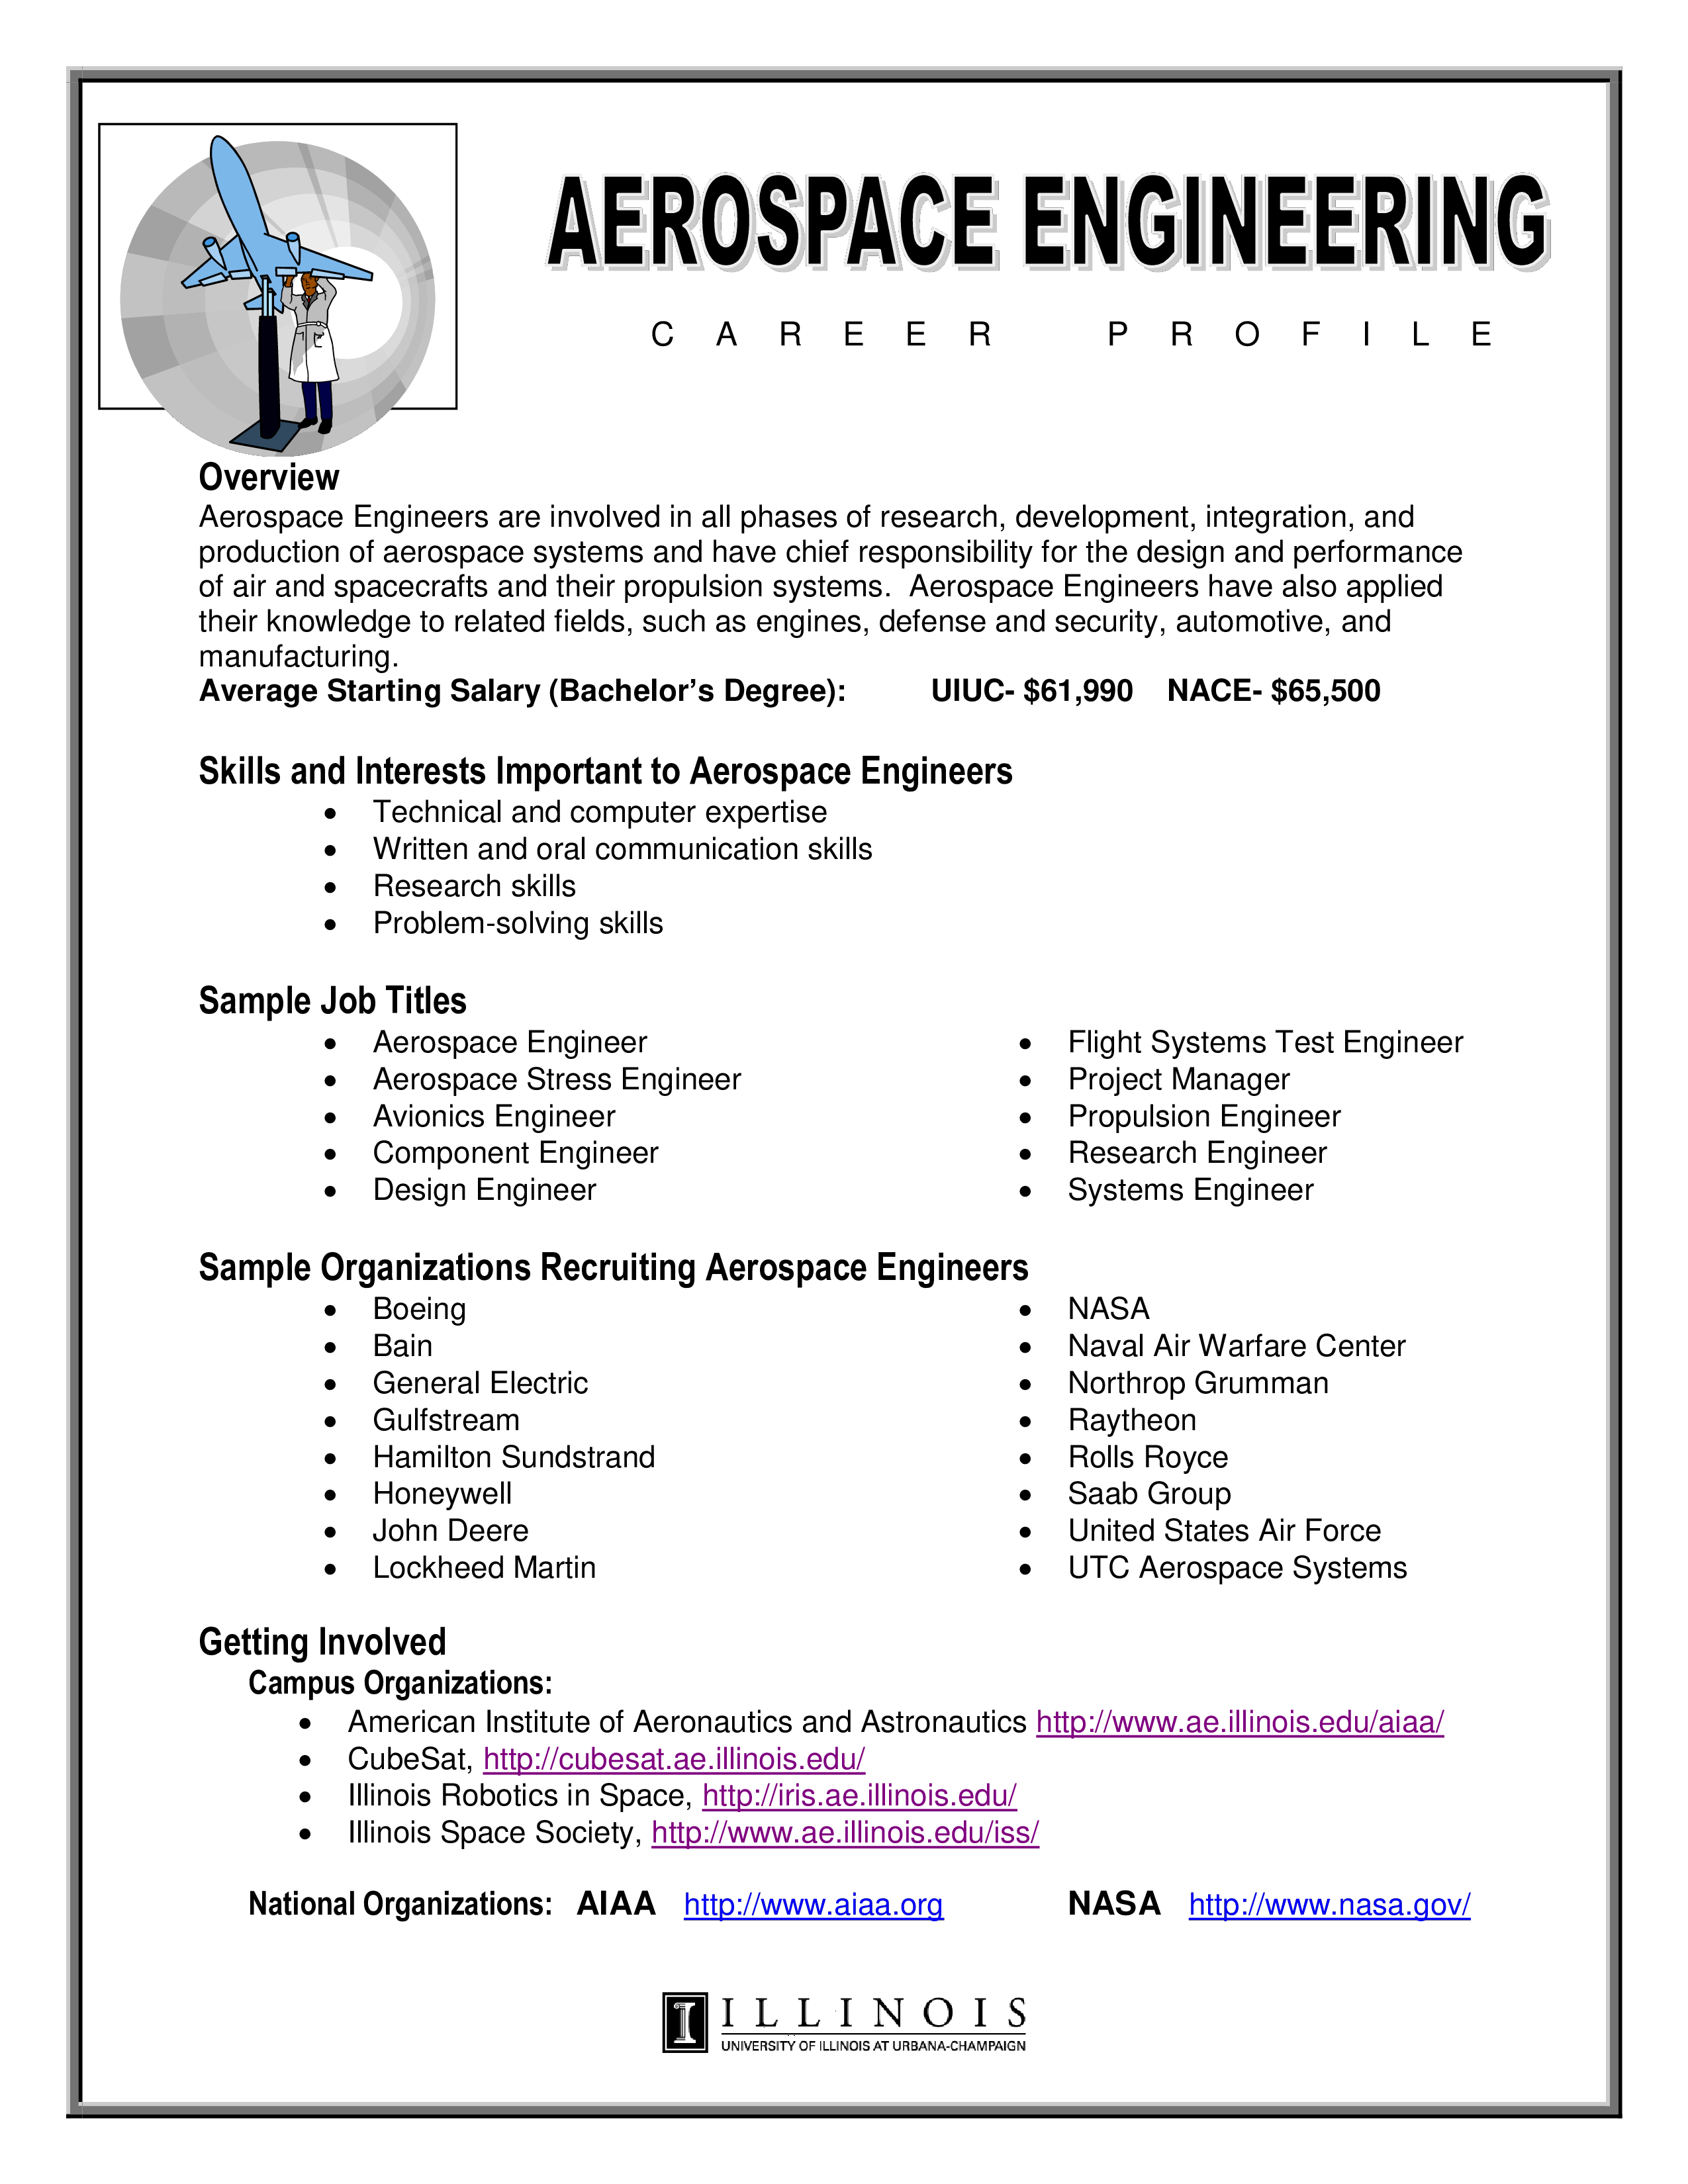 Free Experienced Aerospace Engineering Resume | Templates at ...